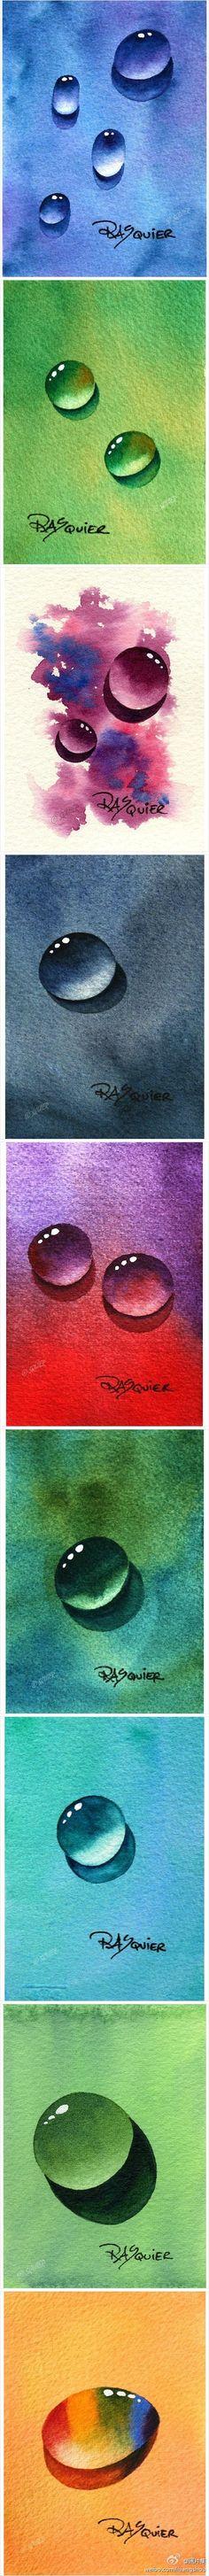 Paper droplets Author:. Rasquier